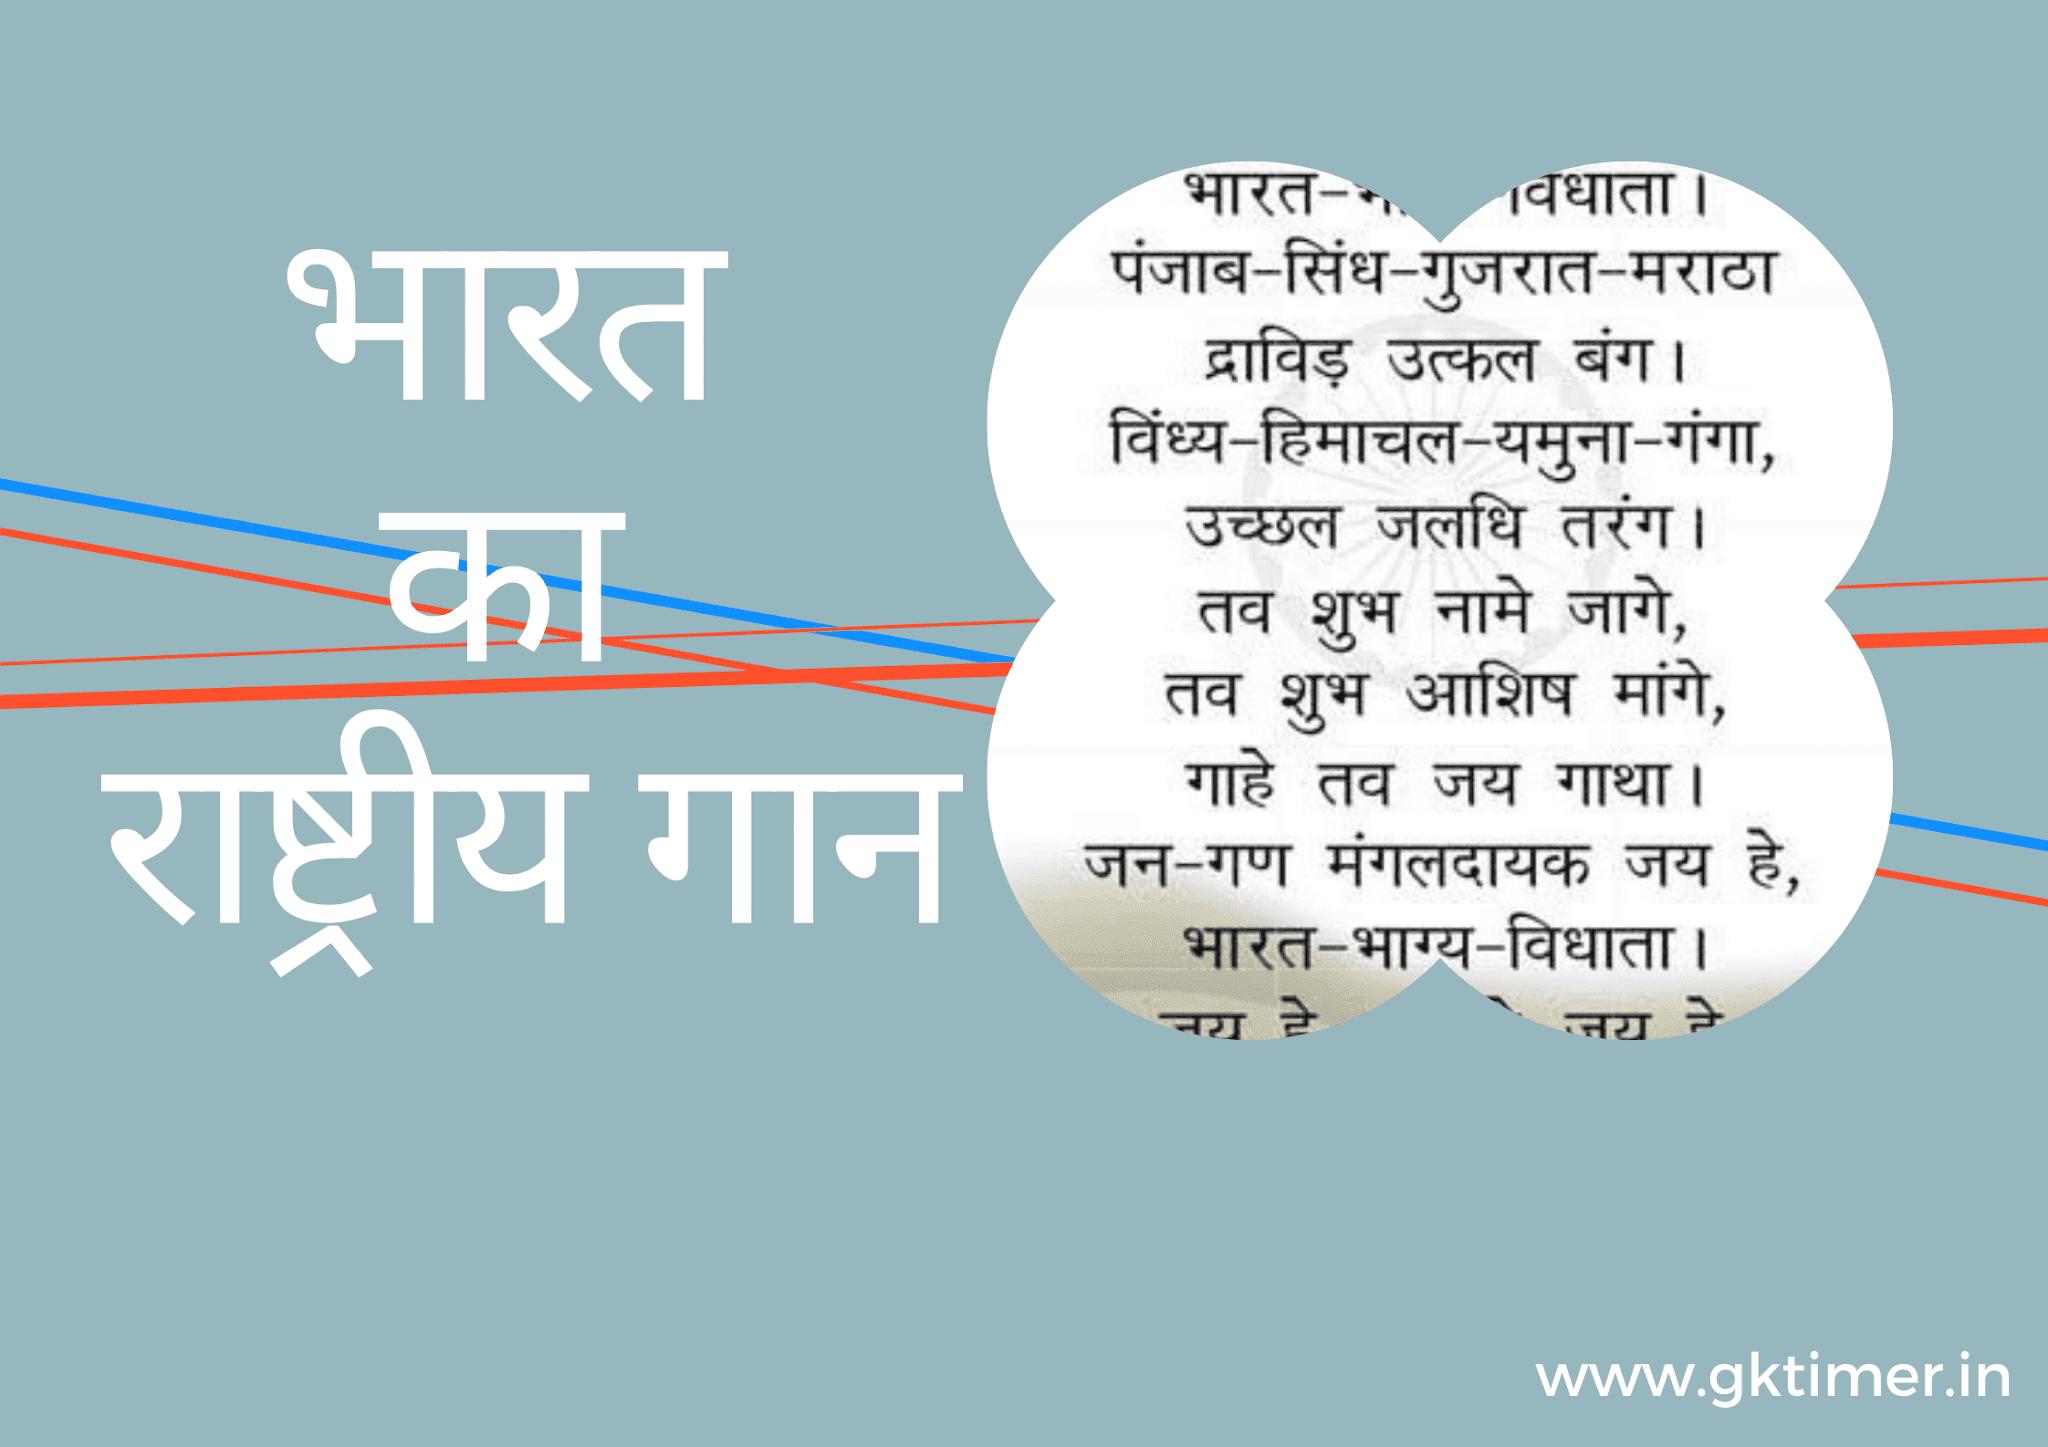 भारत का राष्ट्रीय गान : जन गण मन | National Anthem of India in Hindi